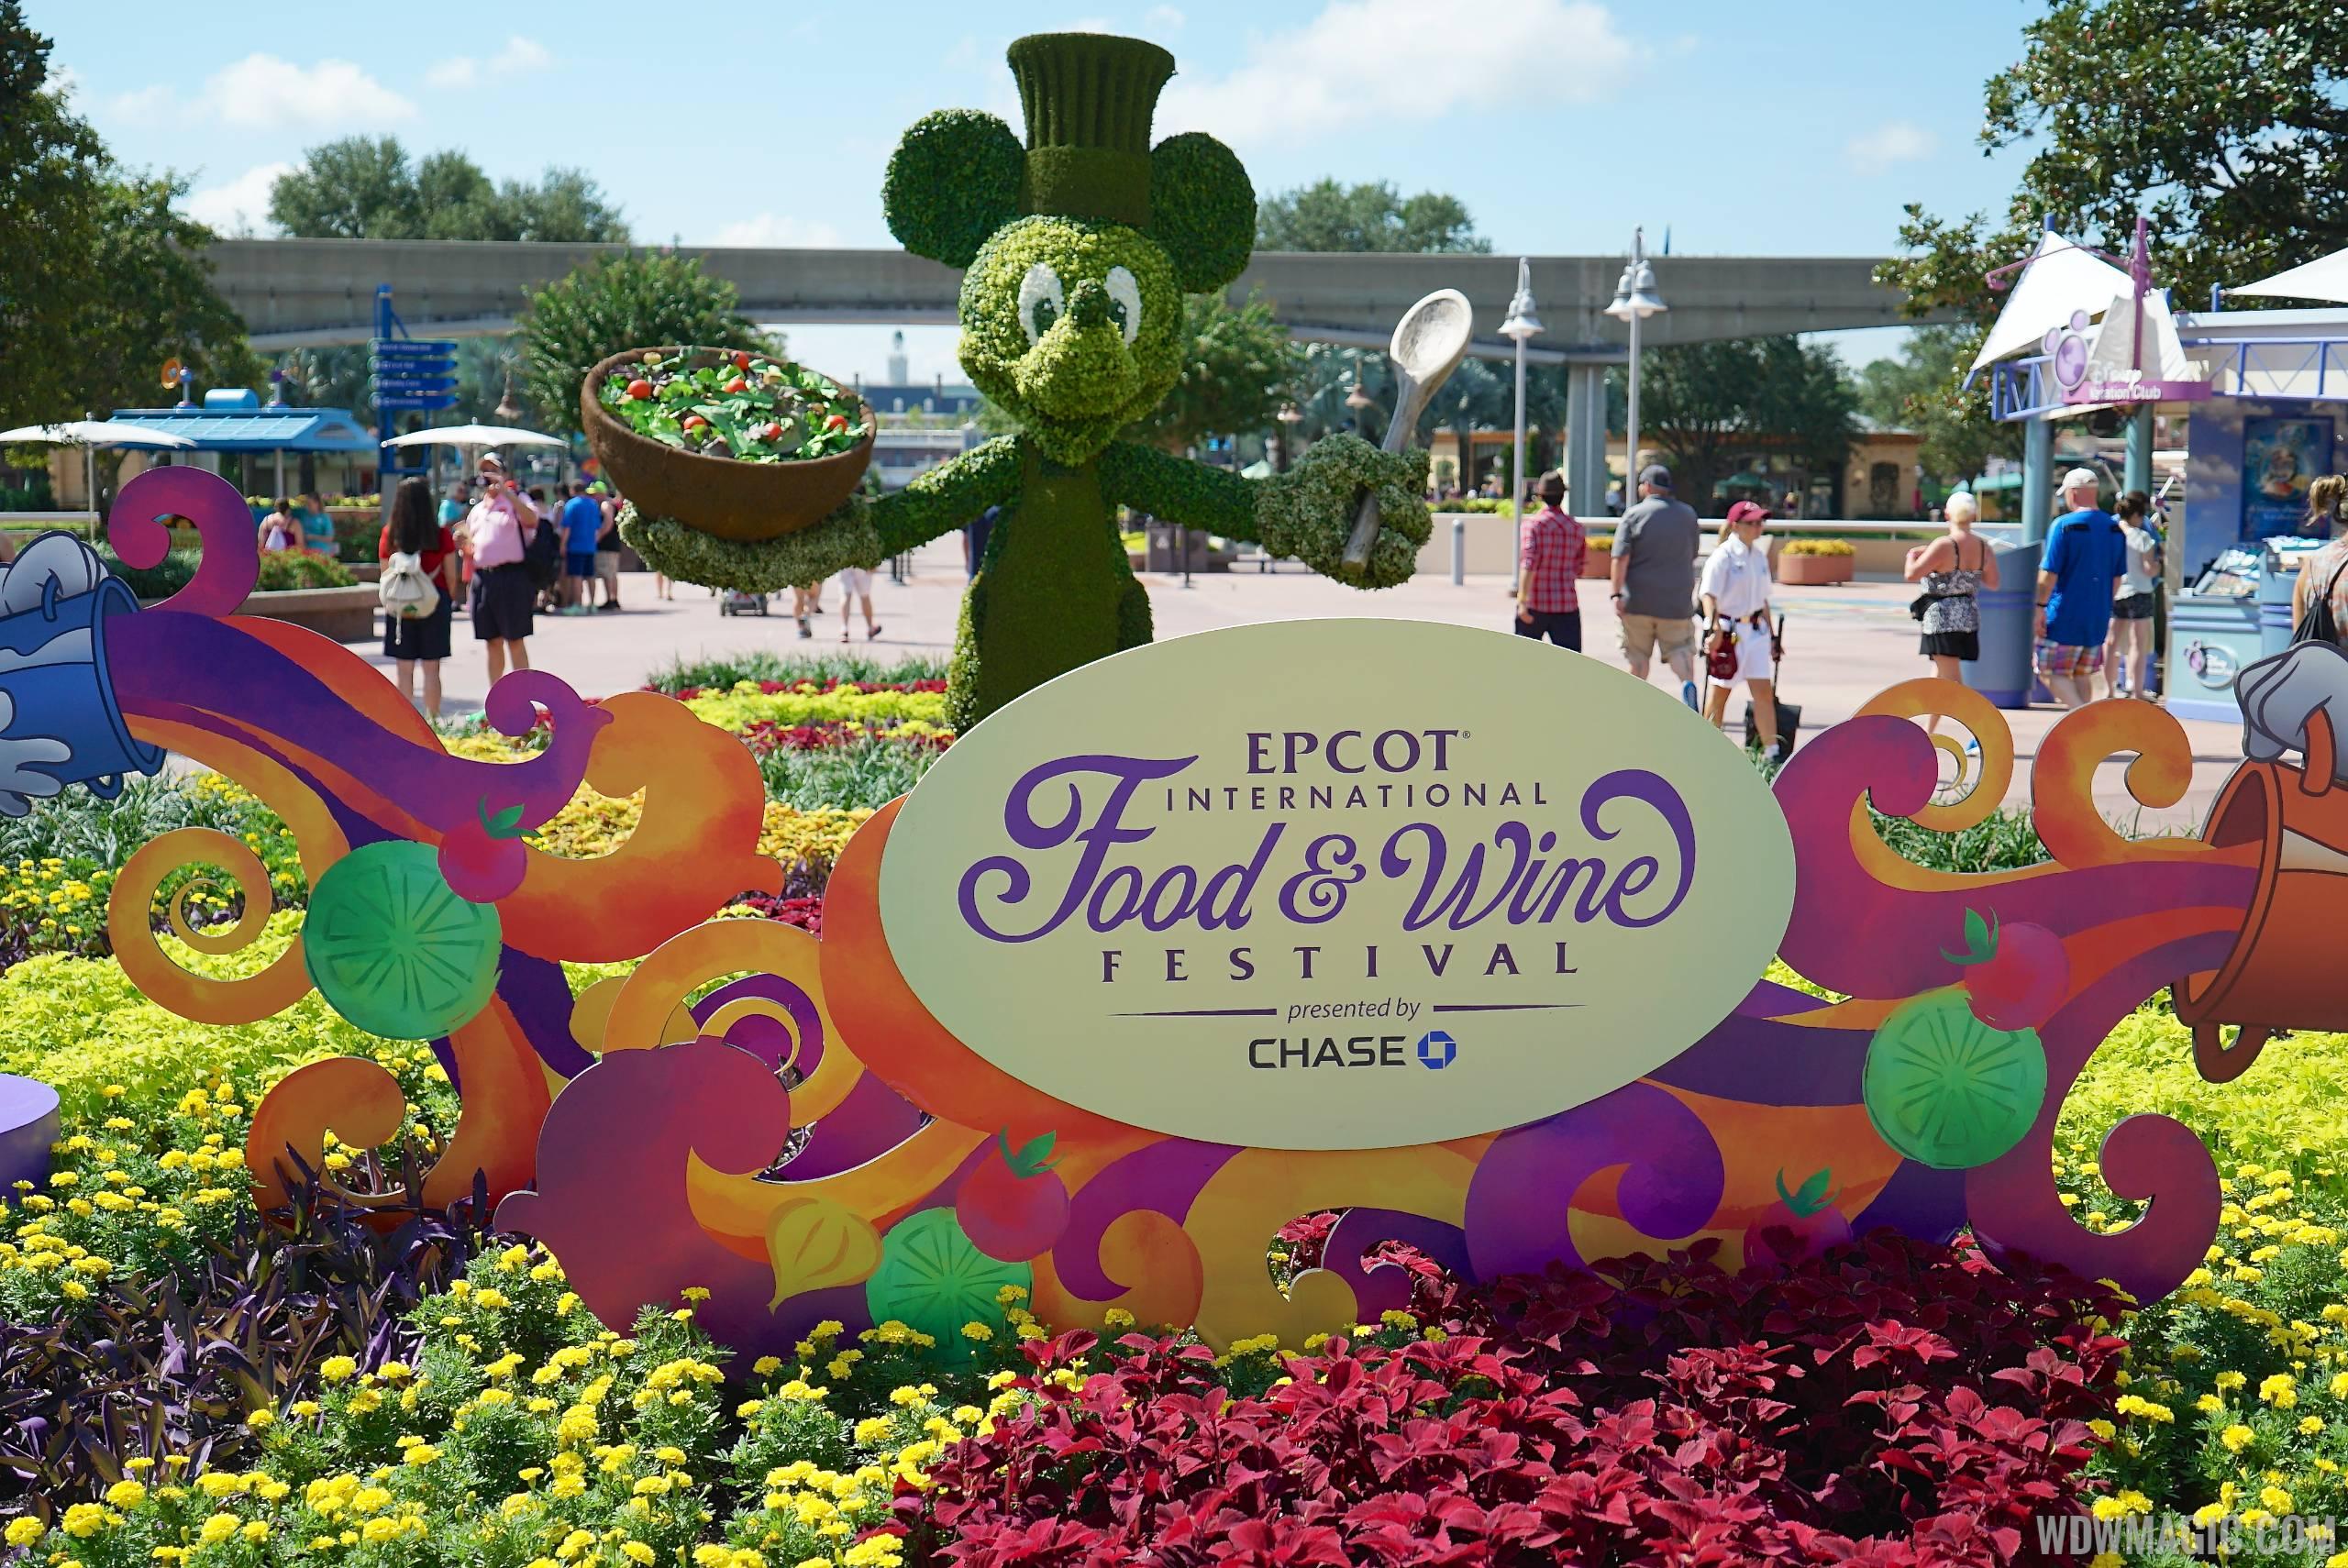 2014 Epcot Food and Wine Festival decor